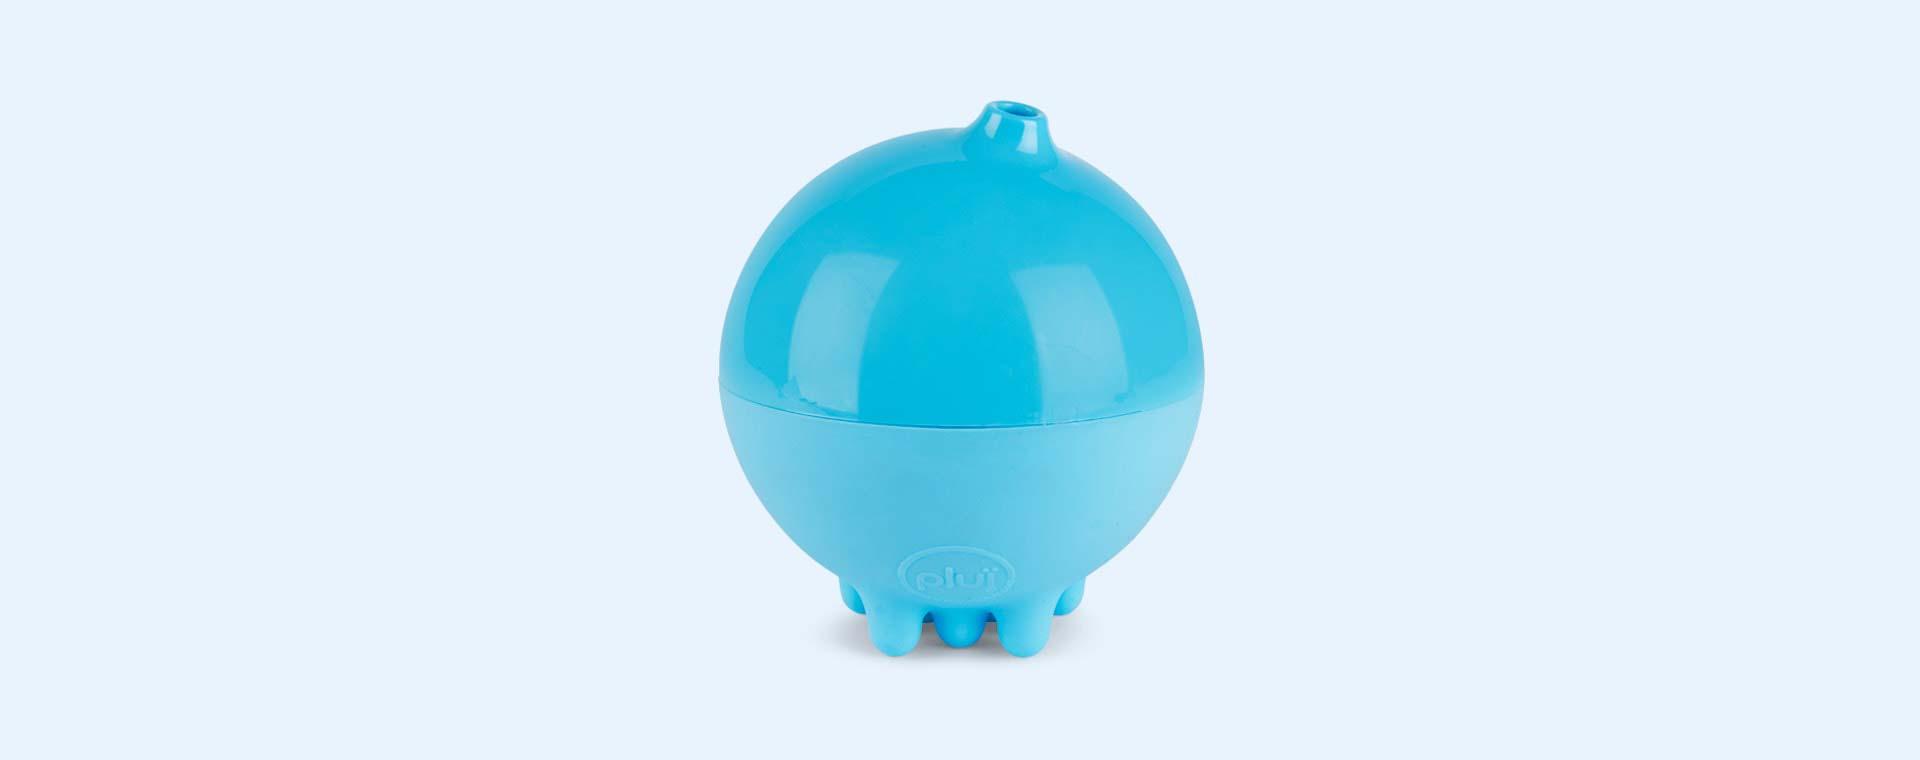 Blue Moluk Plui Rainball Toy